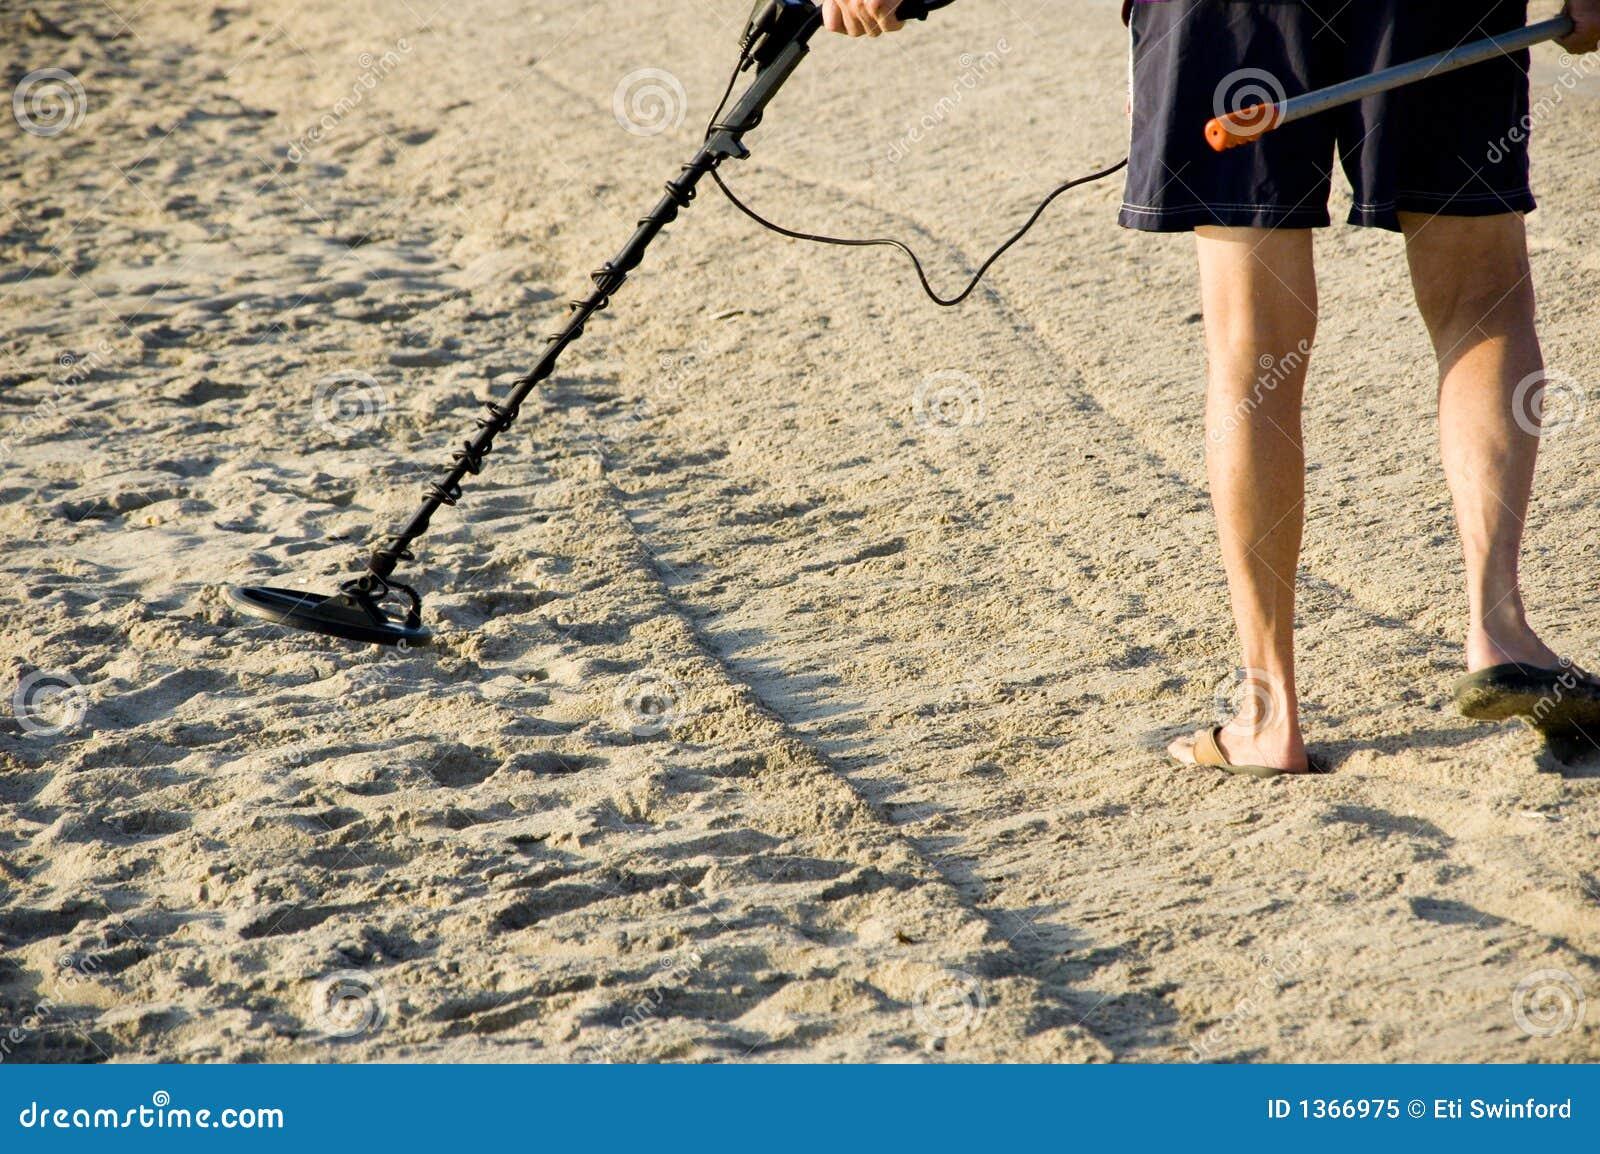 Treasure hunter on the beach.